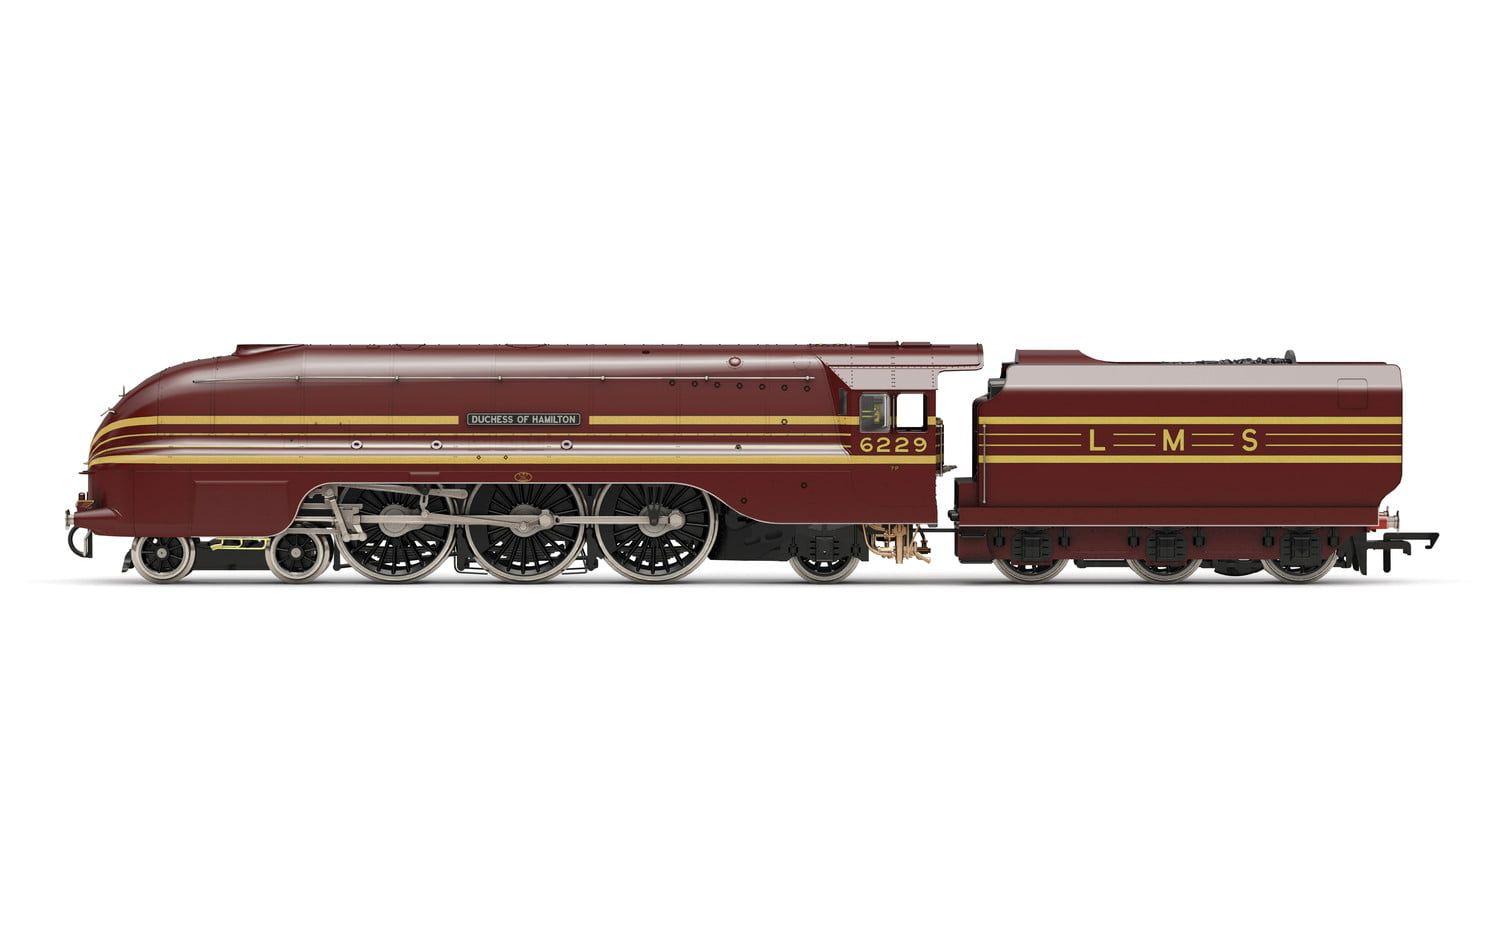 LMS, Princess Coronation Class, 4-6-2, 6229 Duchess of Hamilton - Era 3